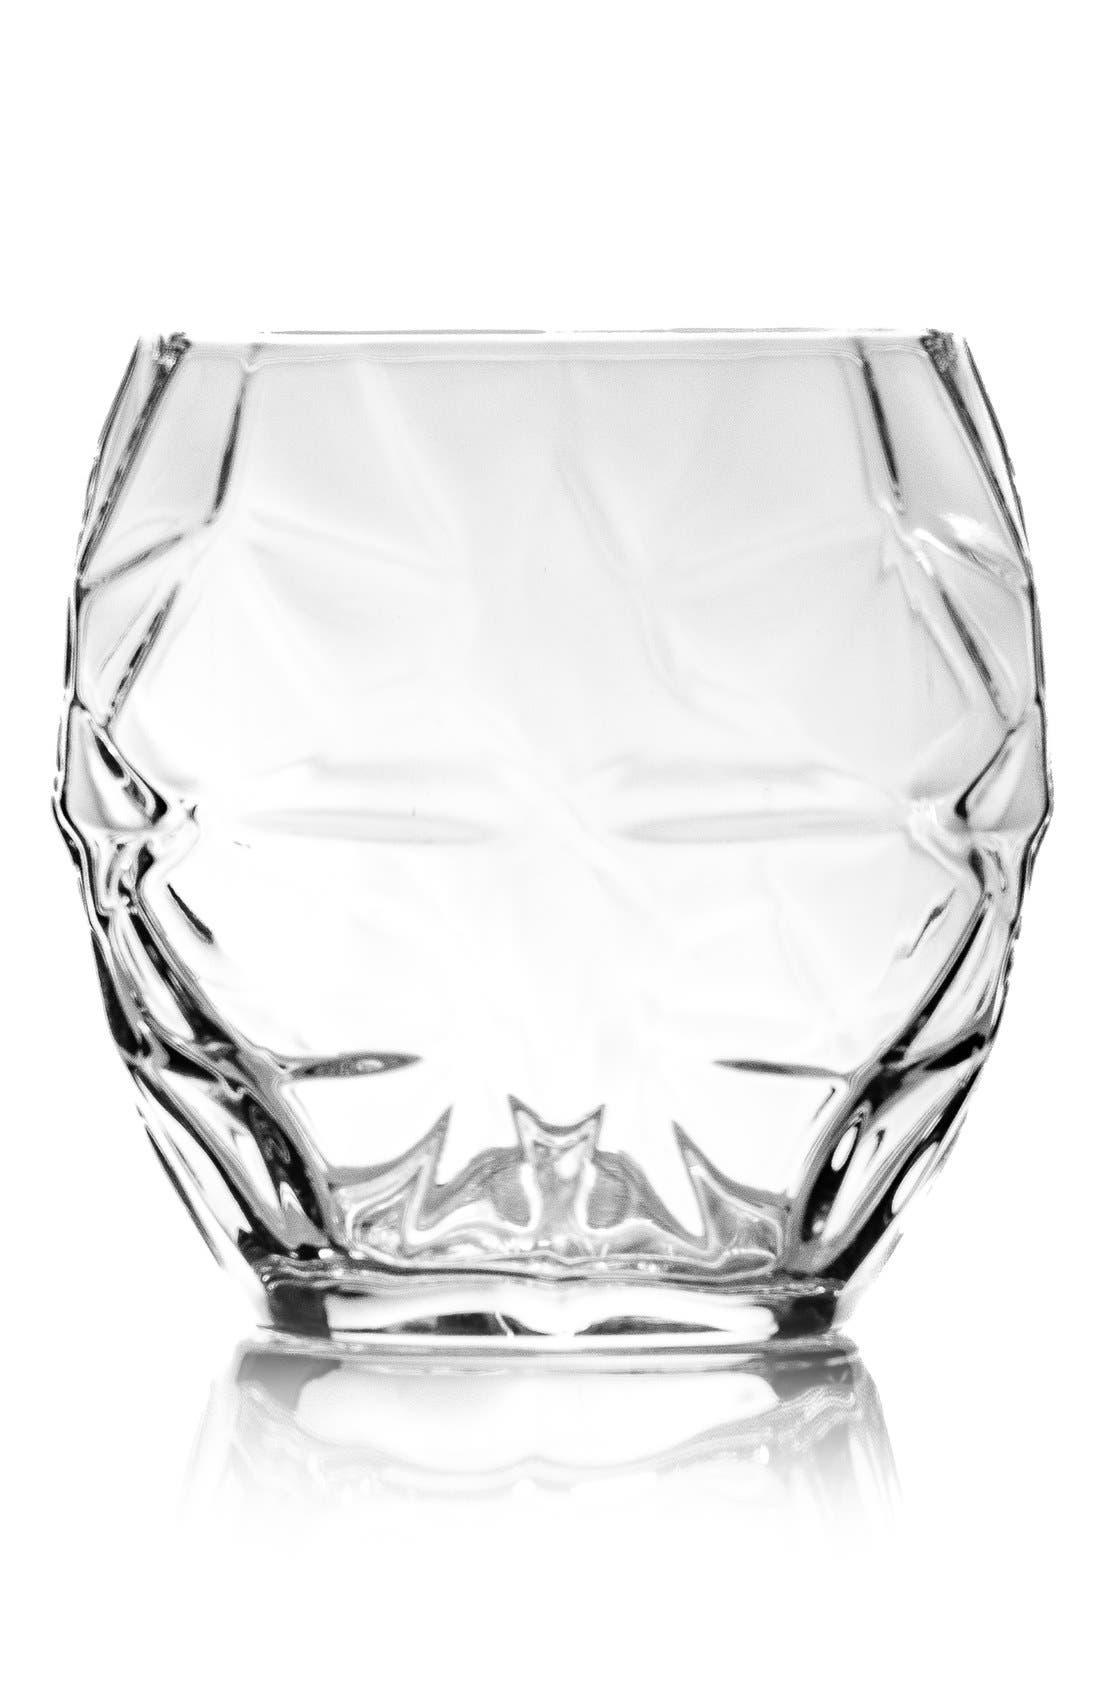 Main Image - Luigi Bormioli Water Glasses (Set of 4)